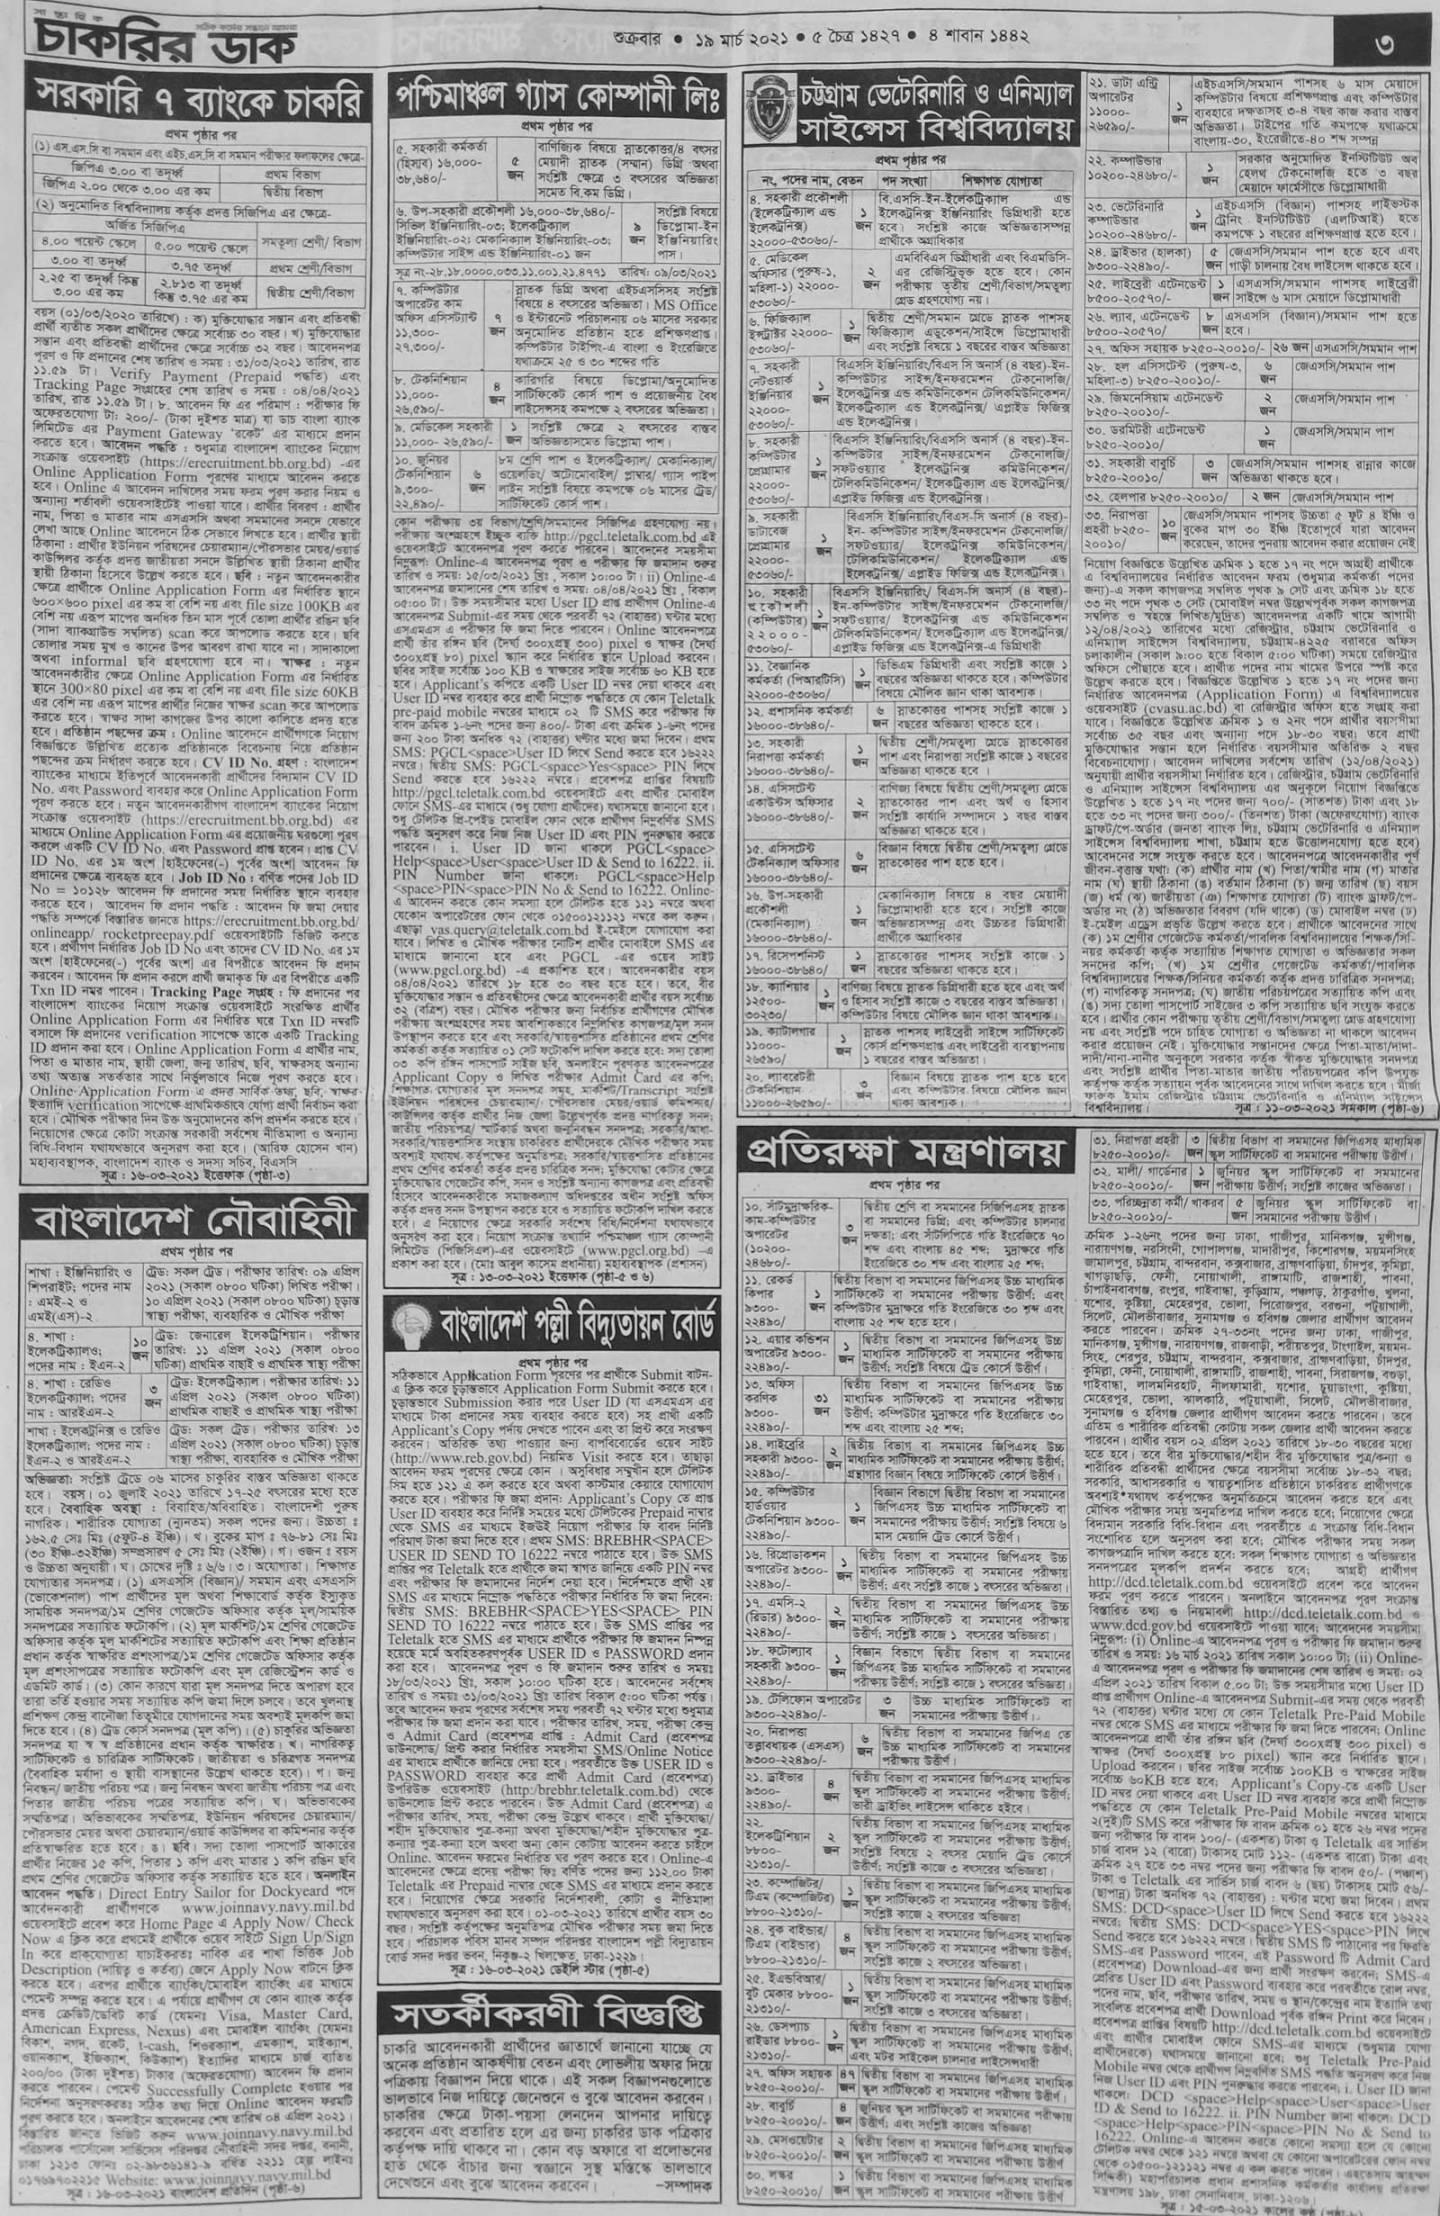 Weekly job newspaper 19 March 2021